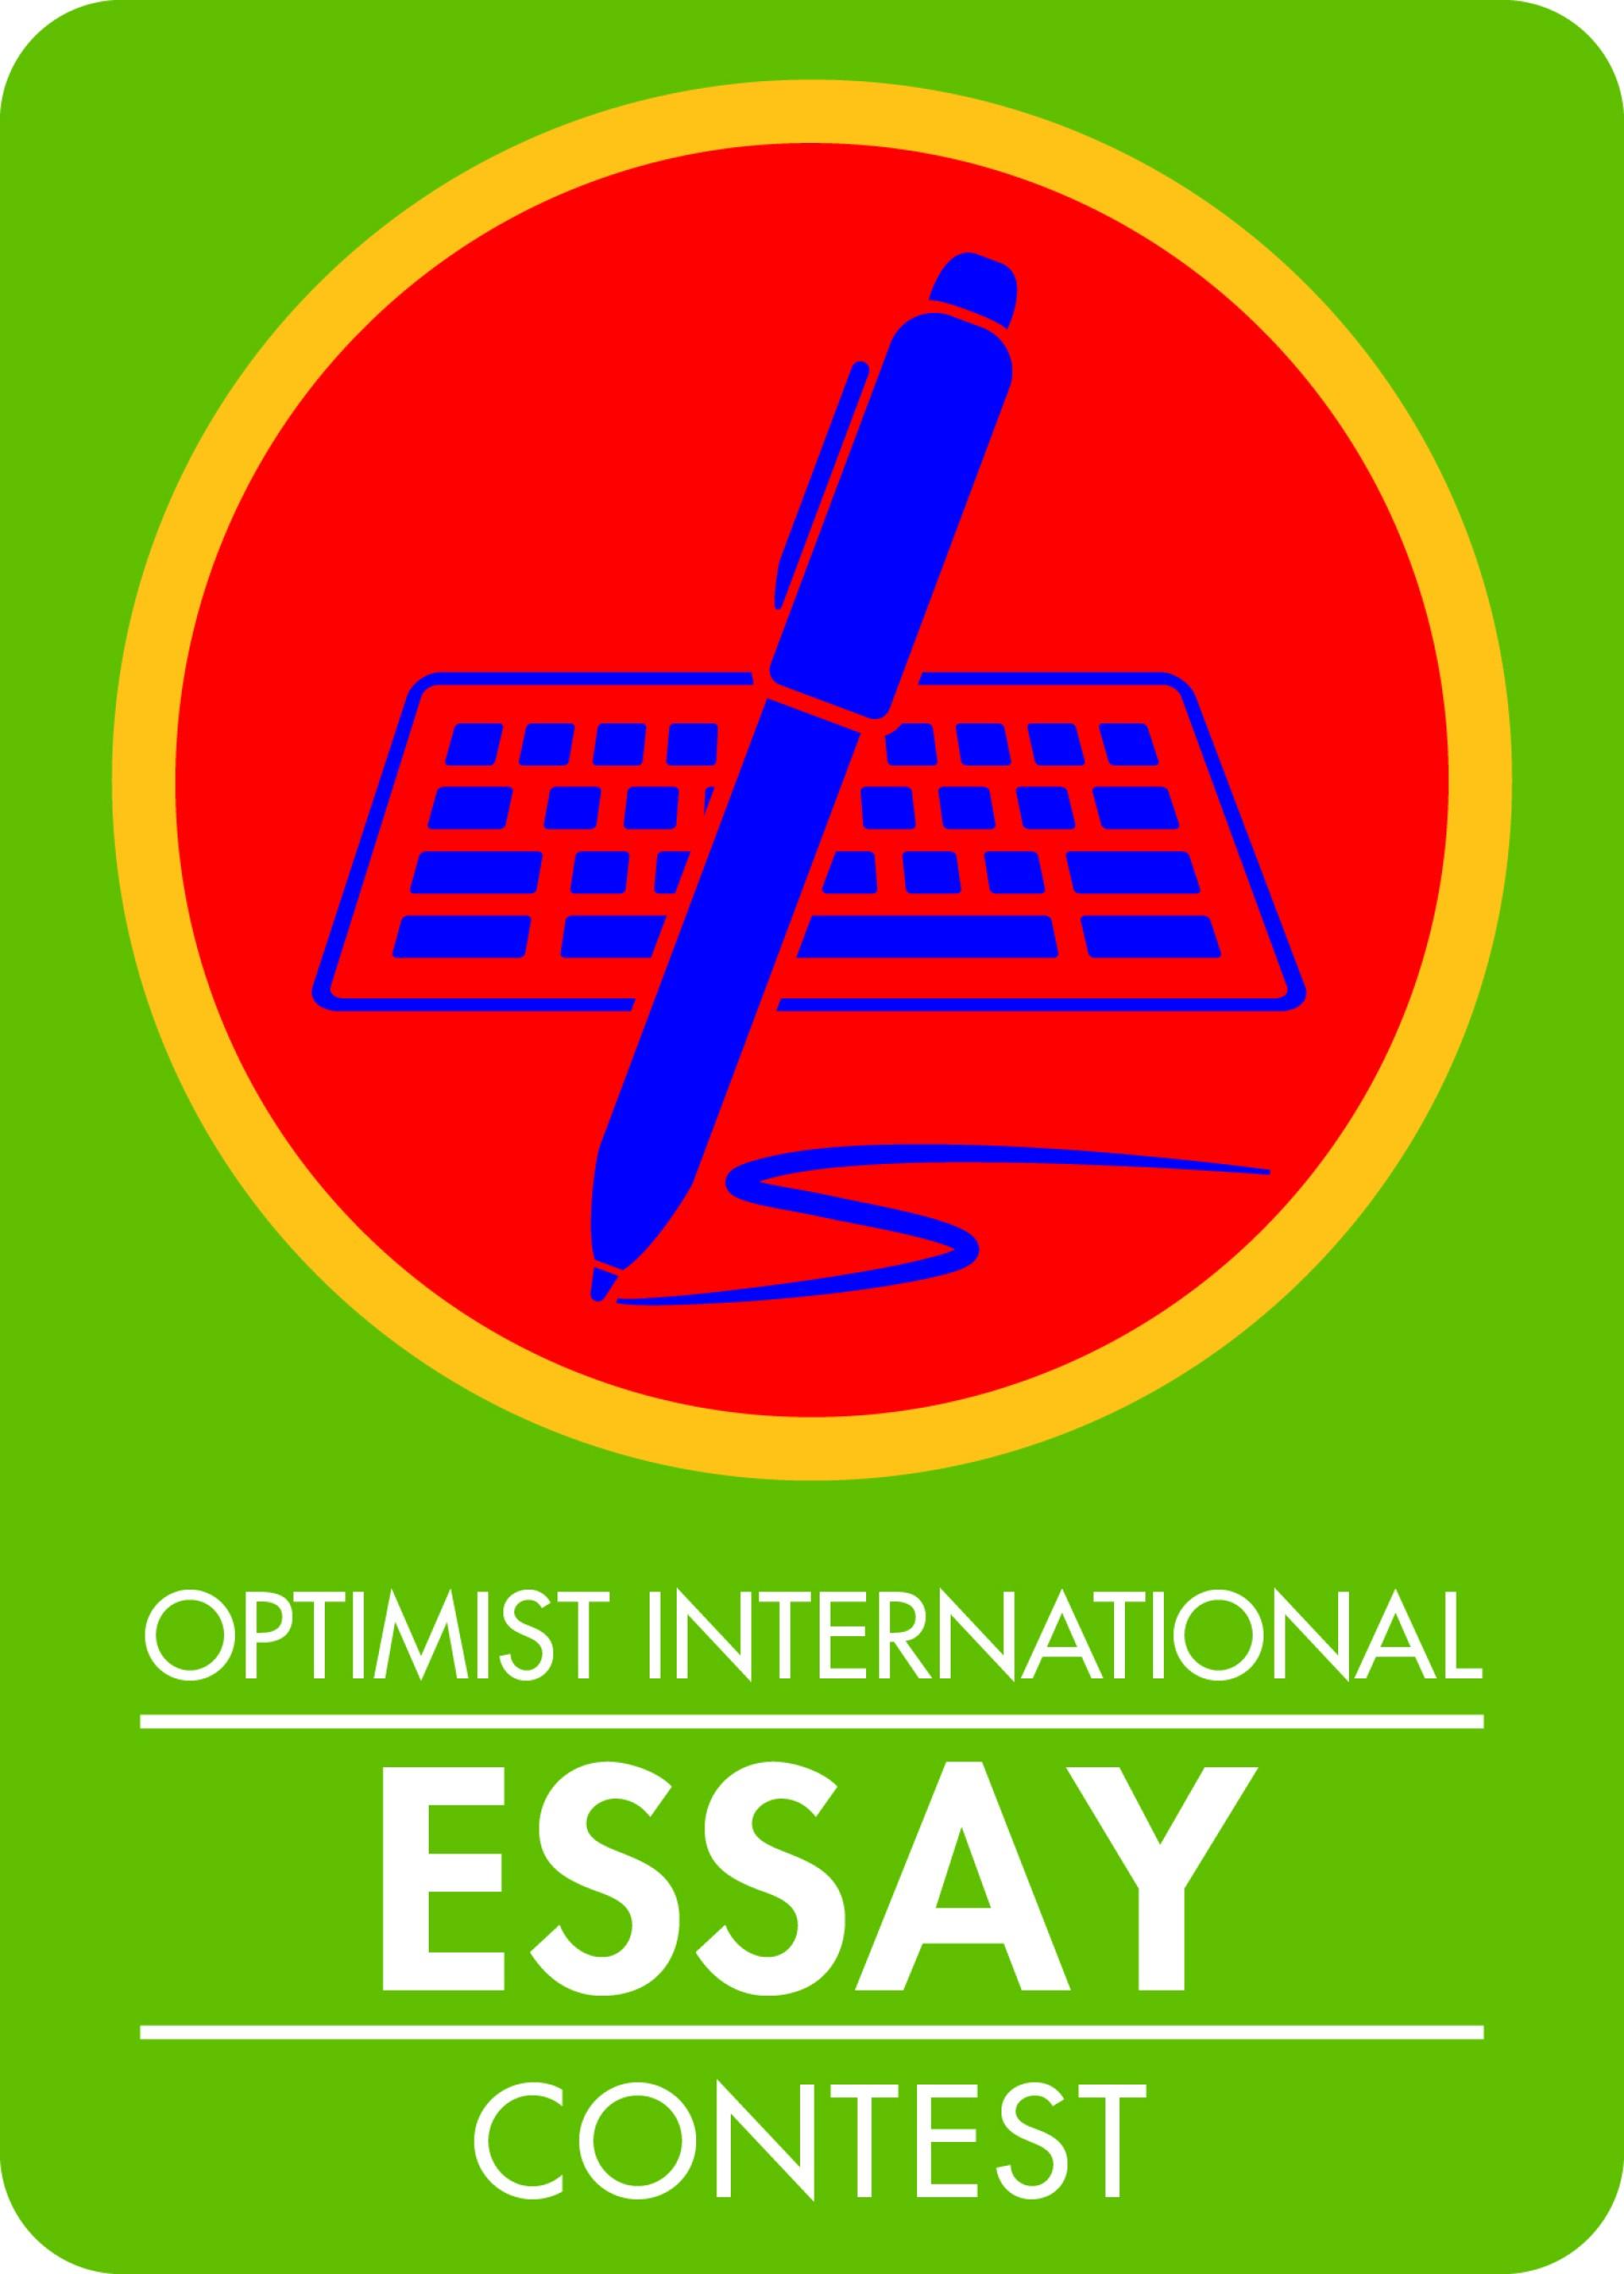 001 Essay Example High Res Optimist International Wondrous Contest Oratorical Winners Rules 1920